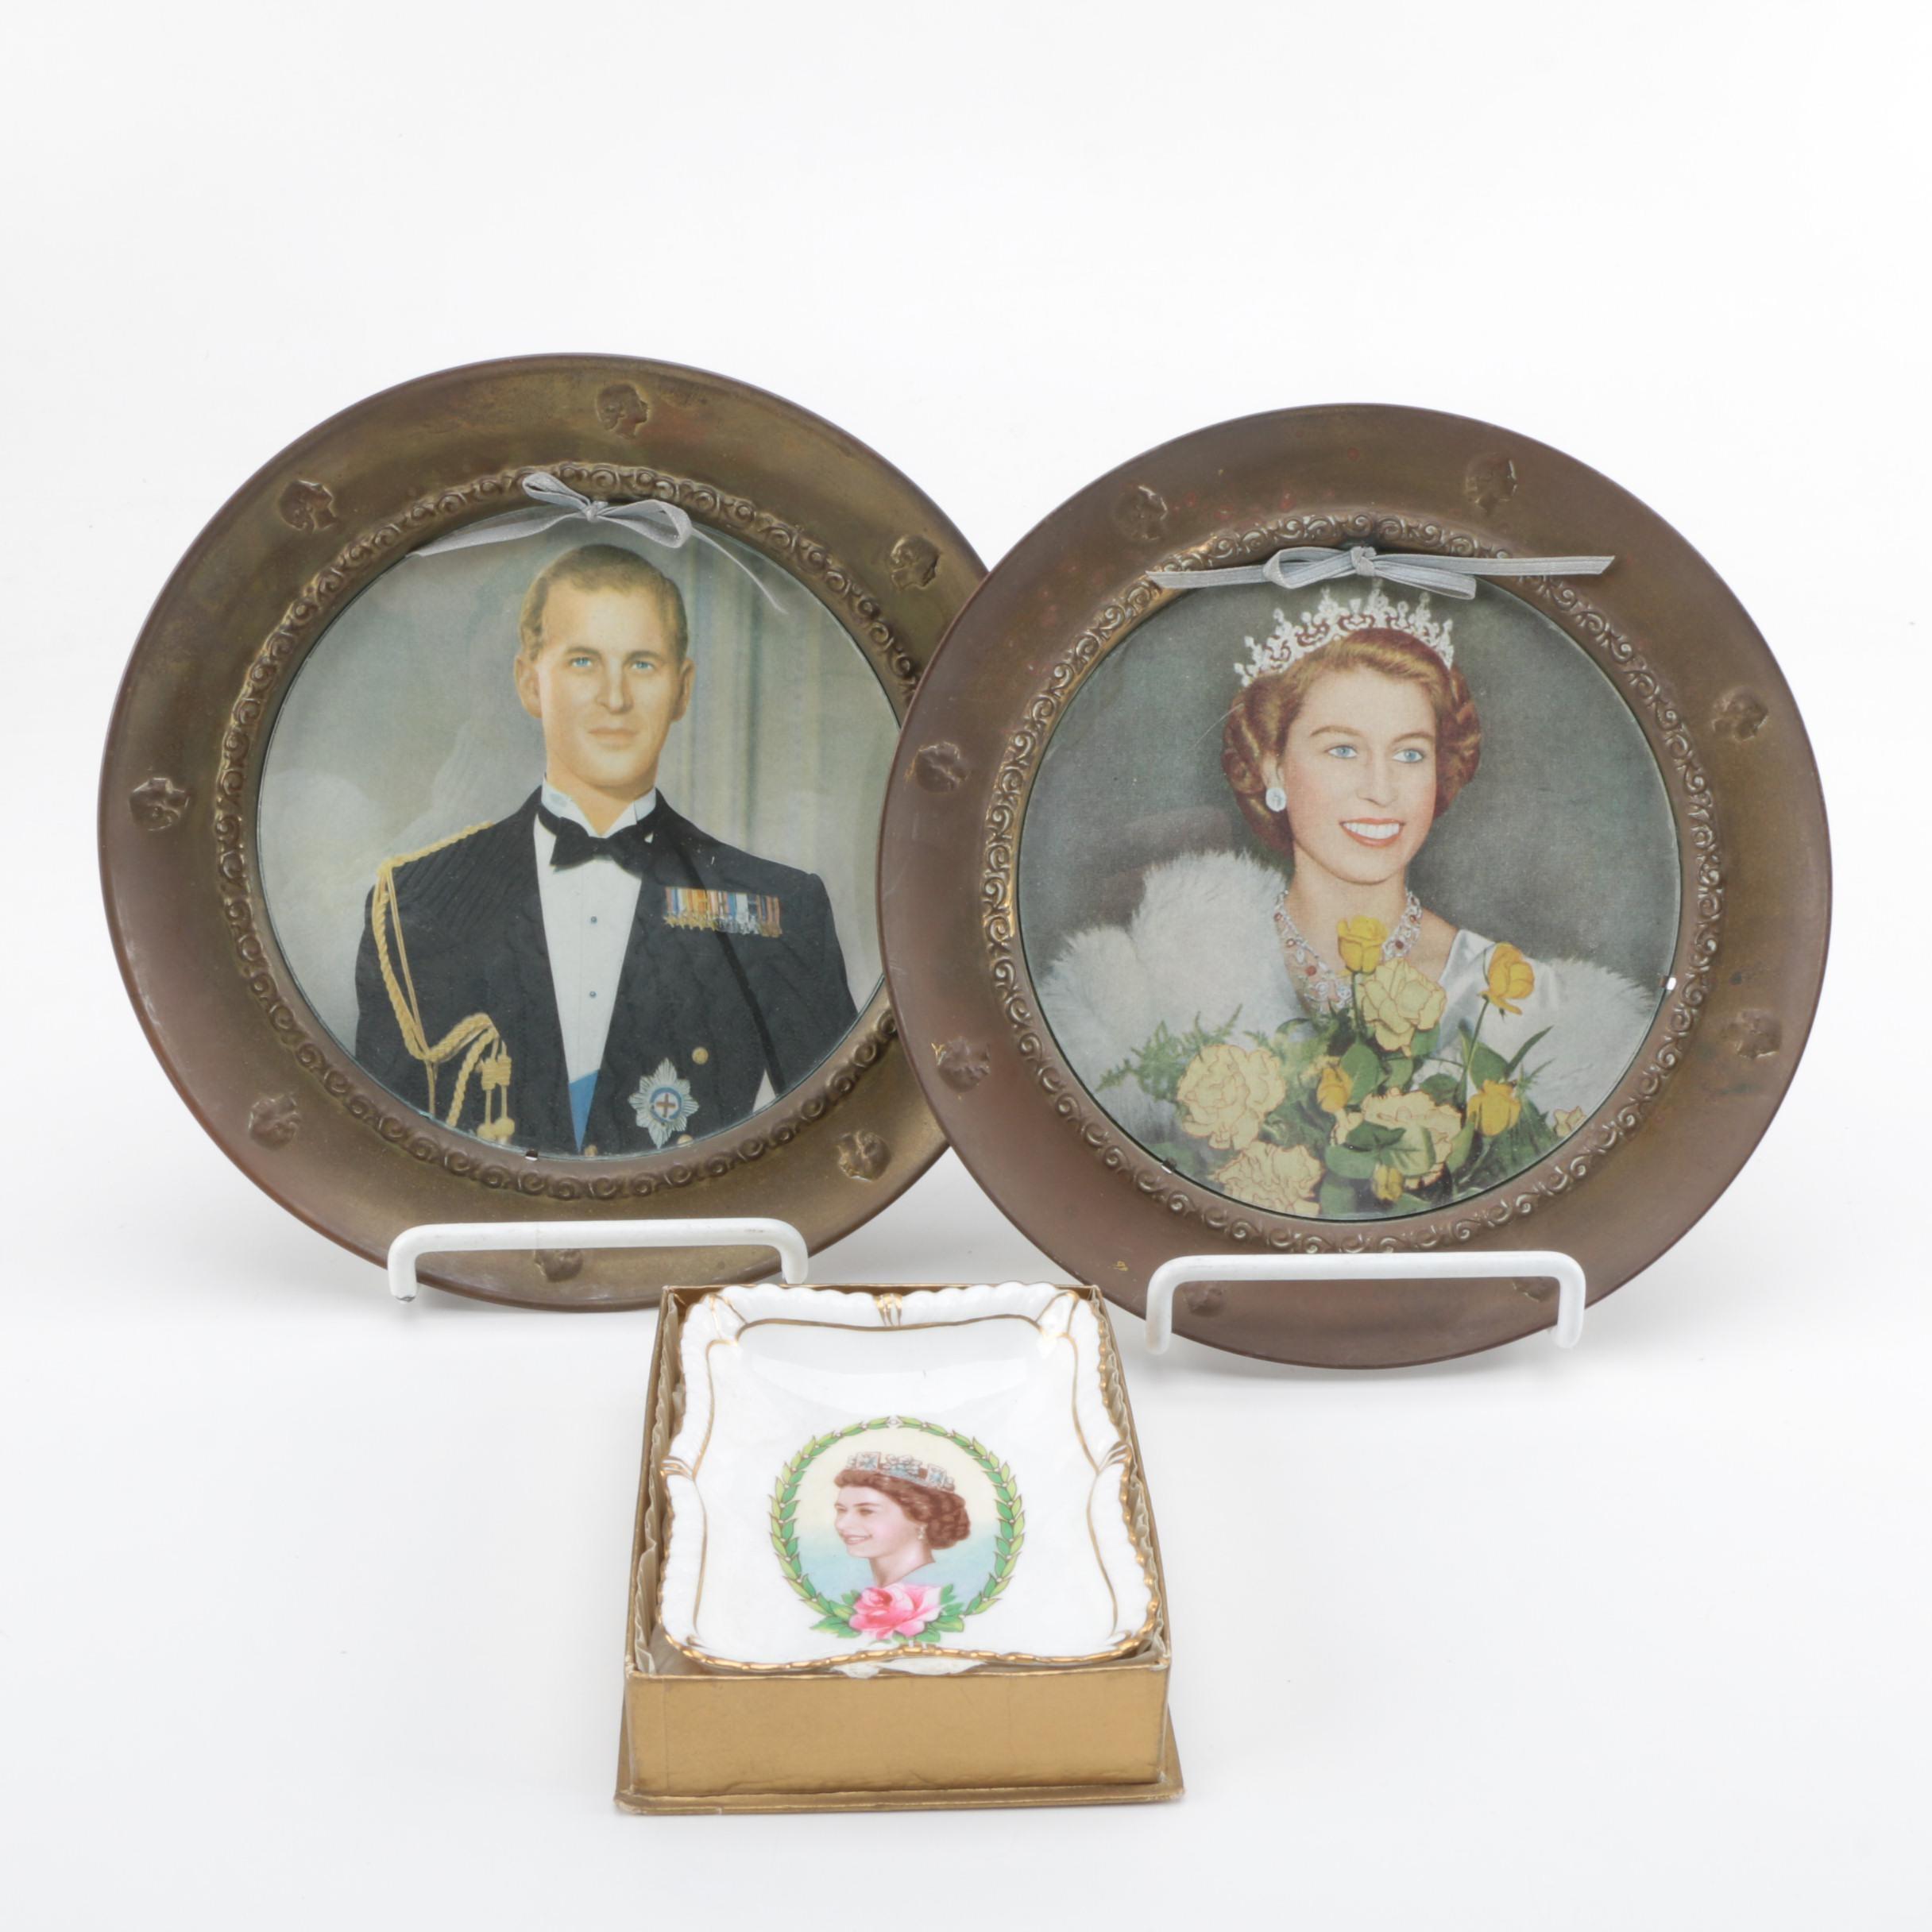 Queen Elizabeth II and Prince Phillip Commemorative Dishes